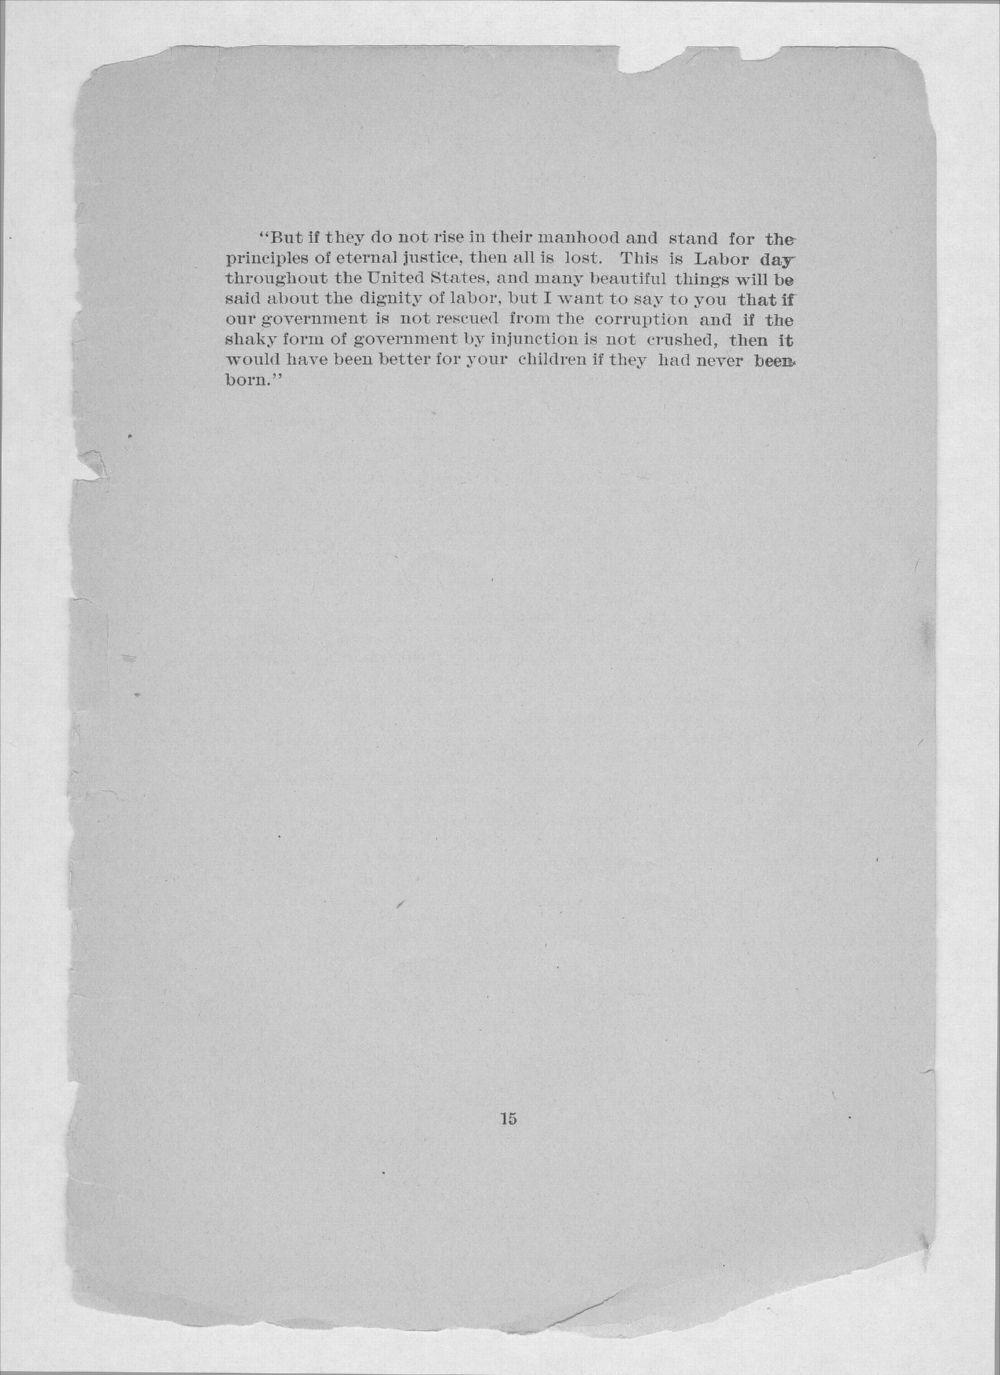 Altgeld's great speech - 15